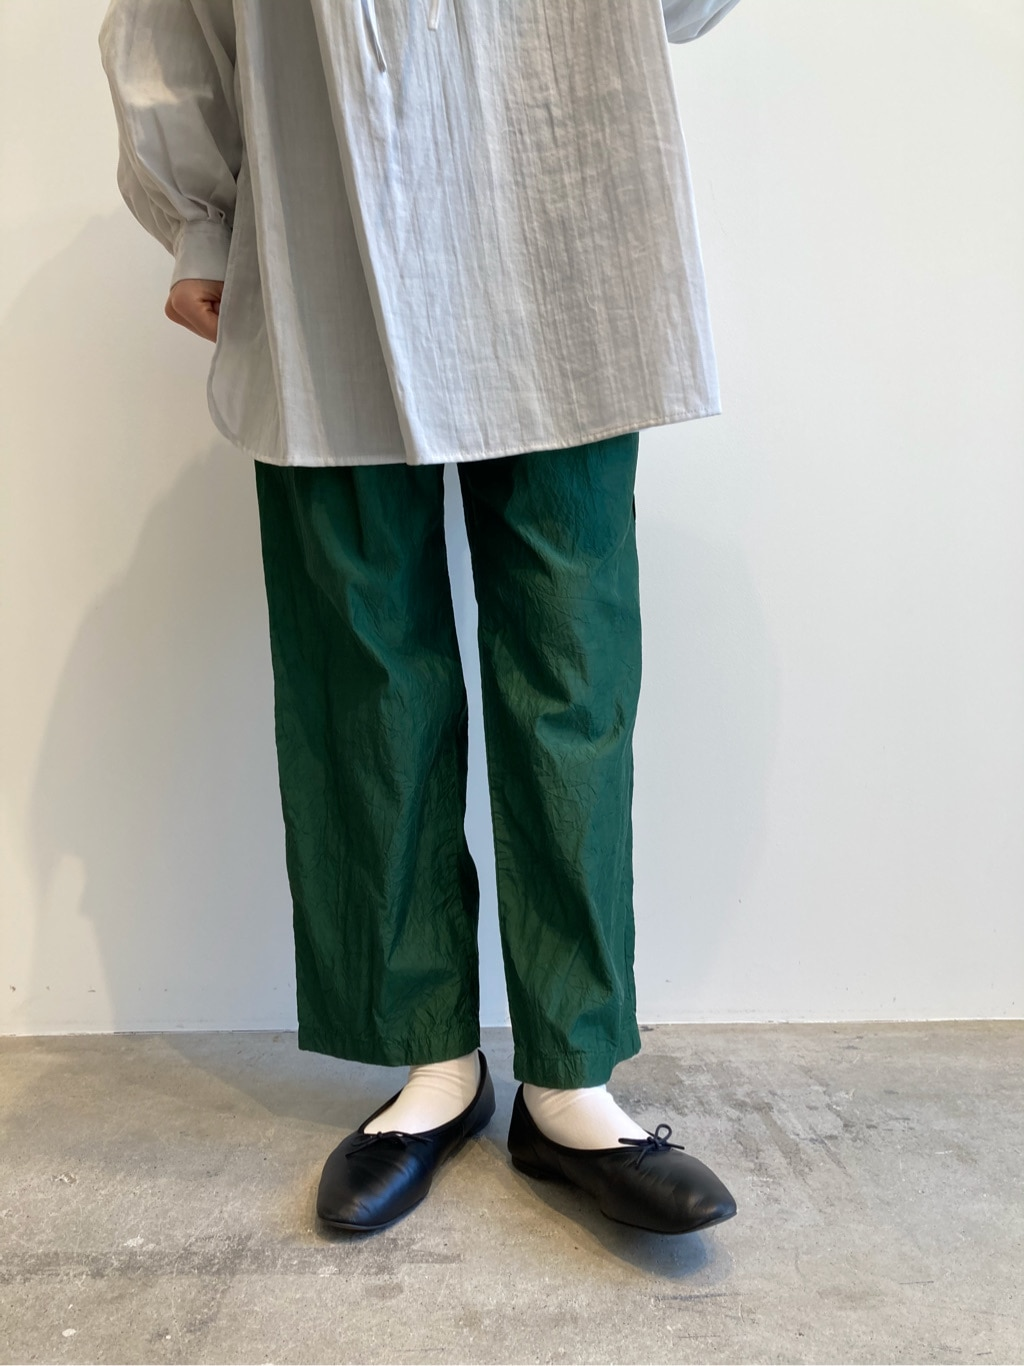 - bulle de savon FLAT AMB 名古屋栄路面 身長:162cm 2021.01.15